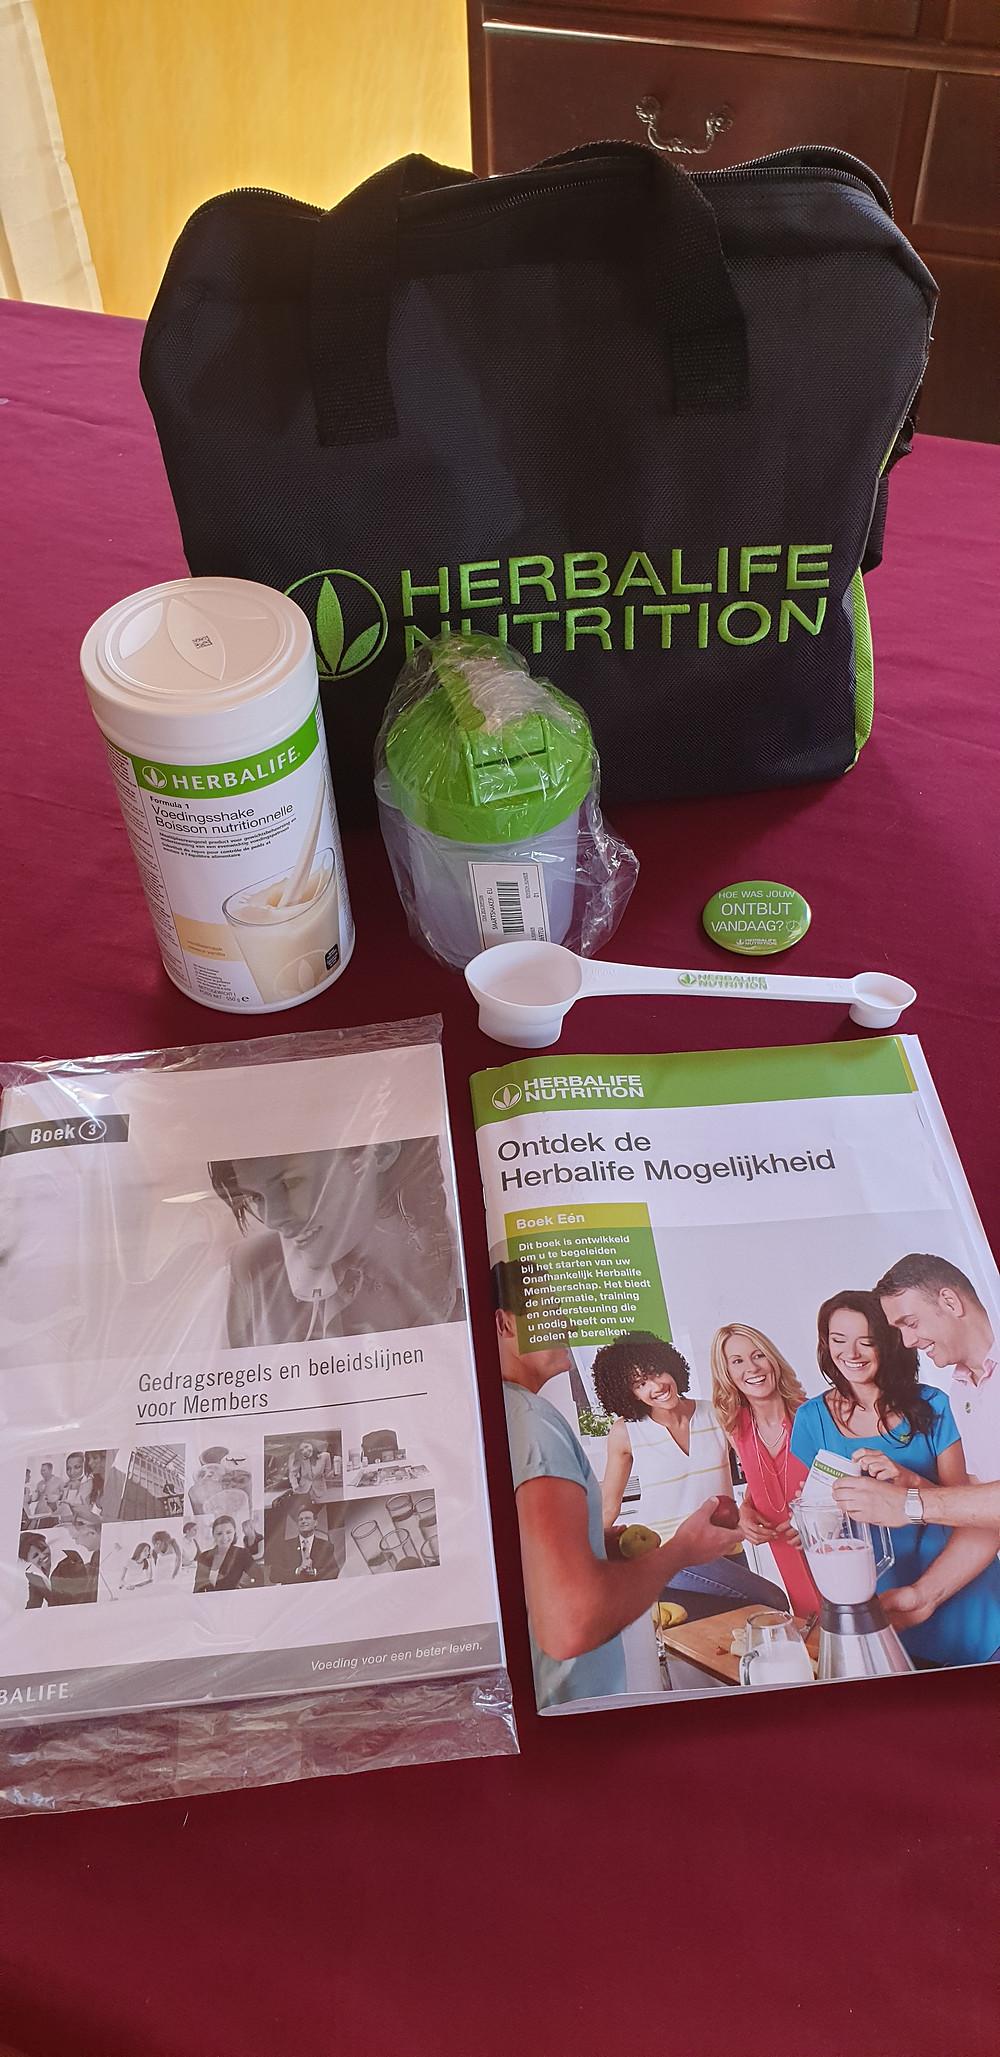 Herbalife starterspakket in België kost iets meer dan 50 €.